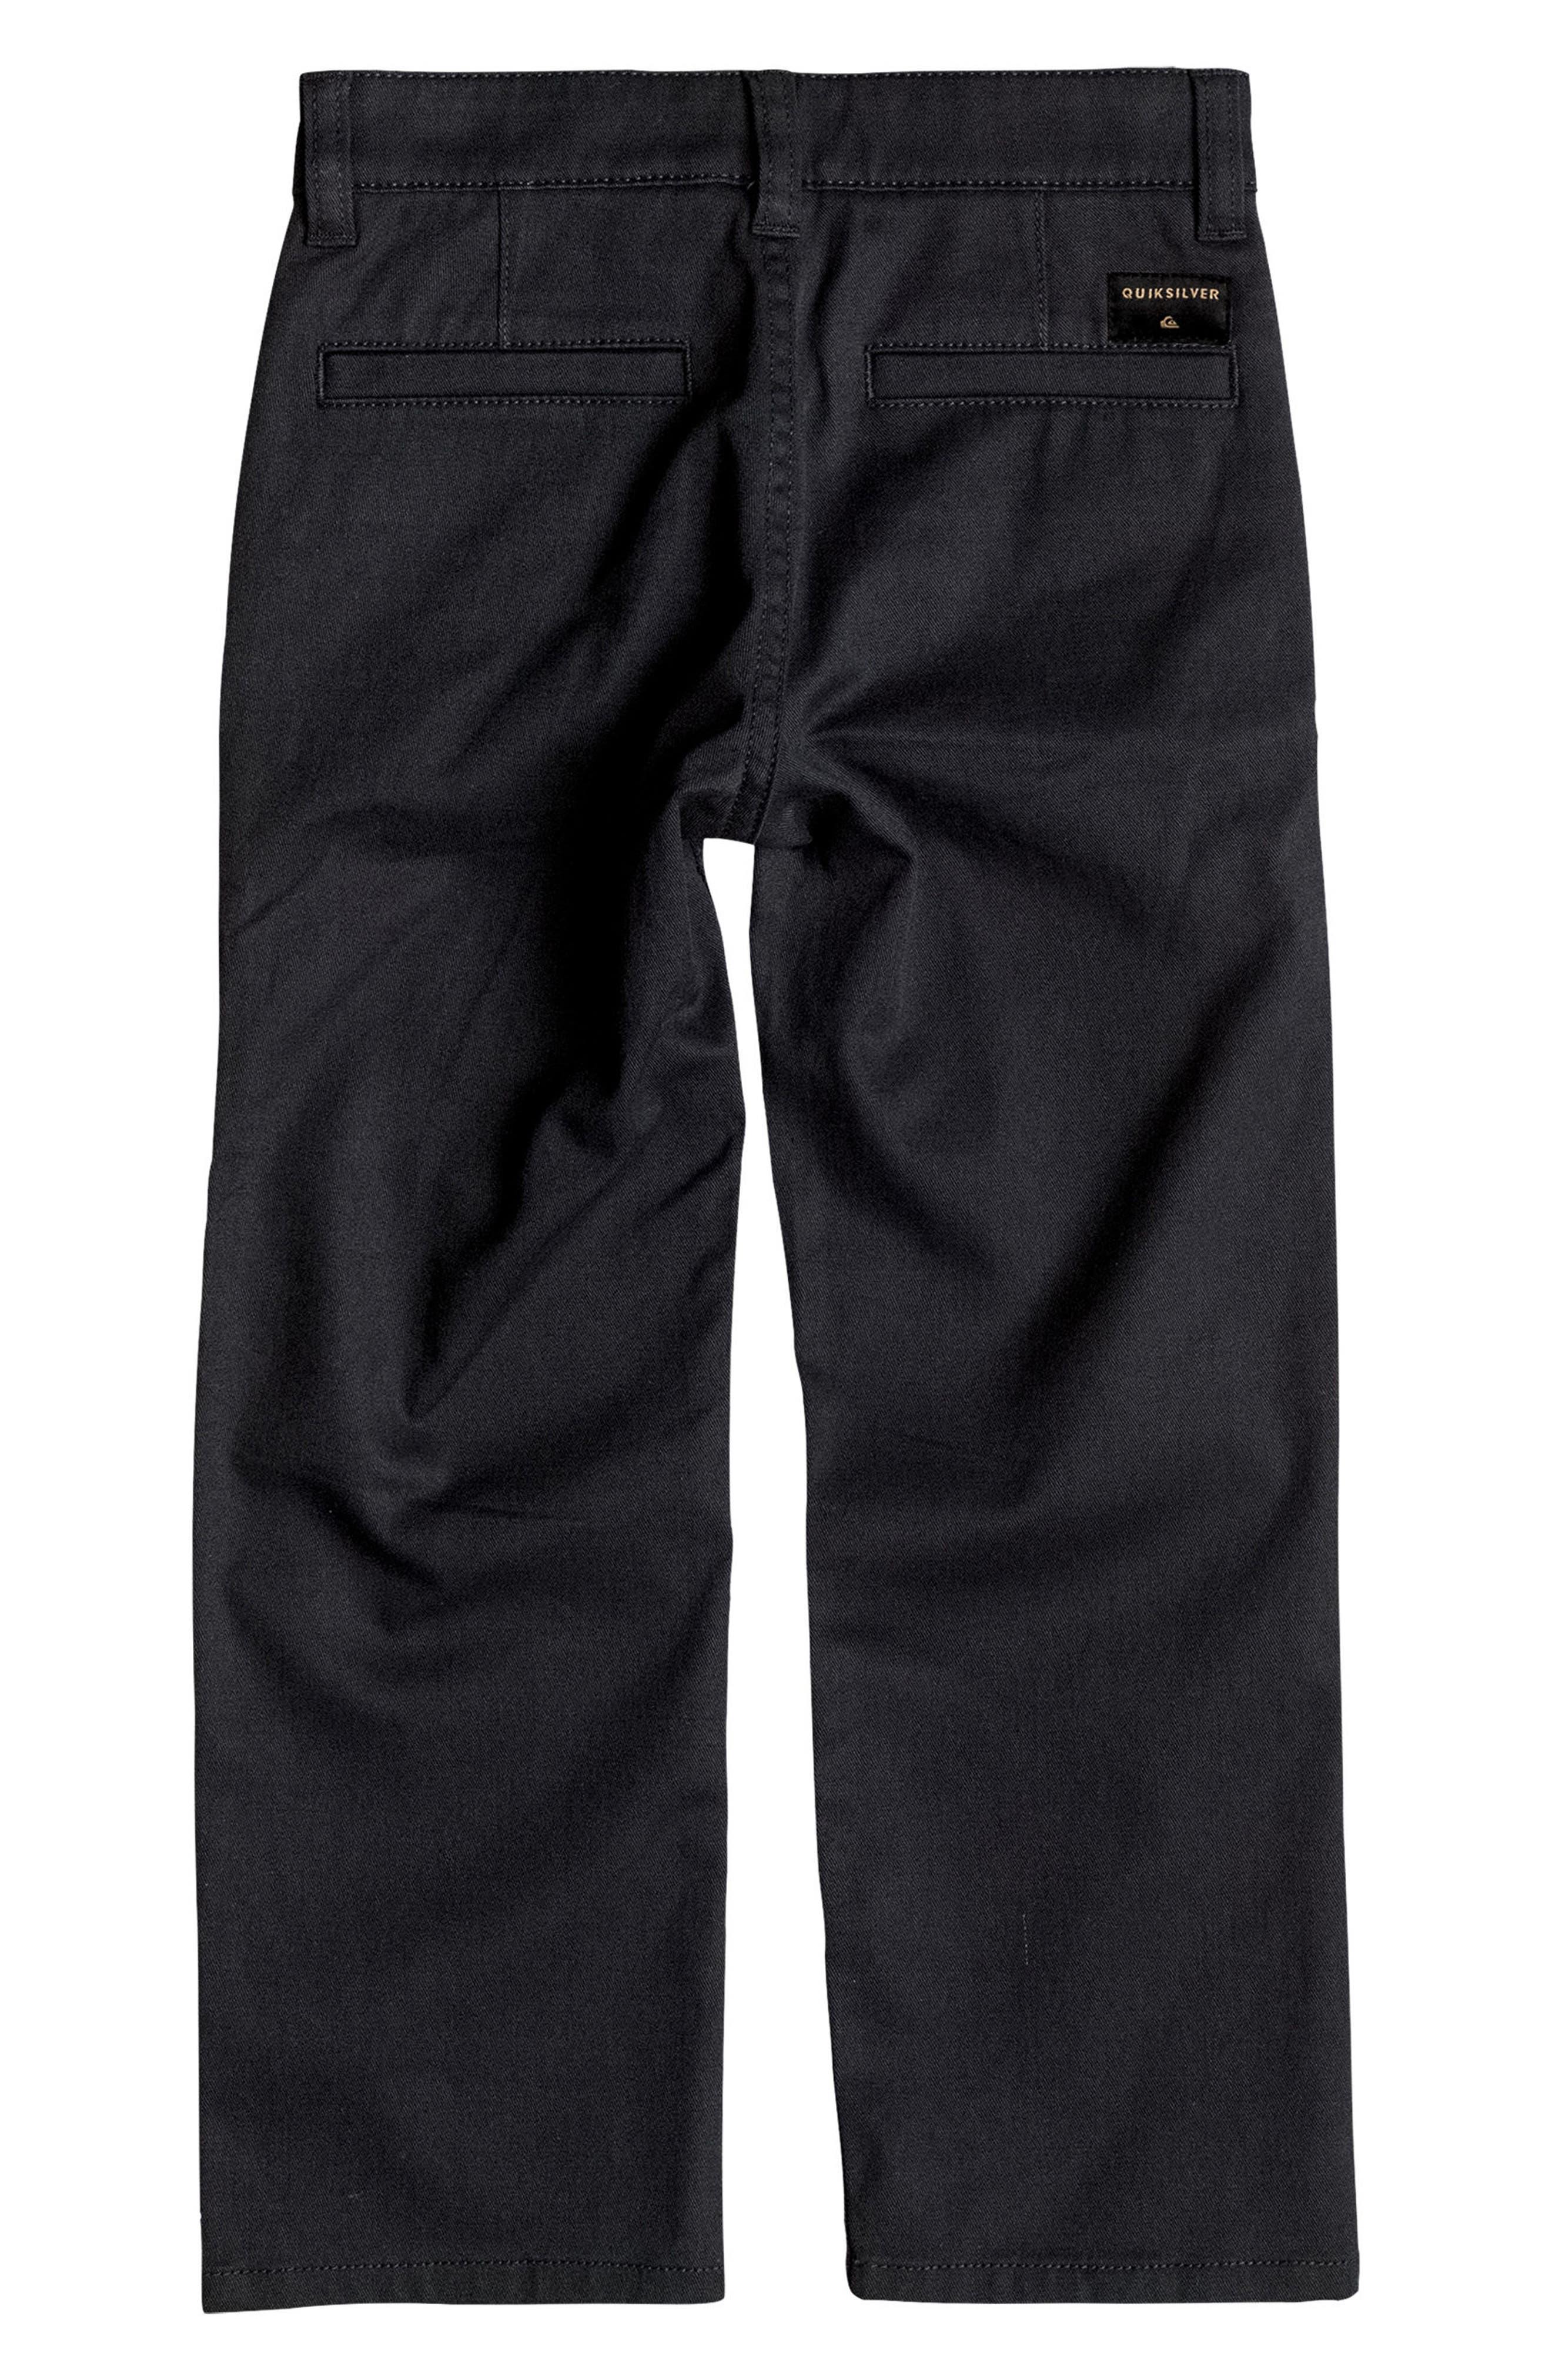 Everyday Union Pants,                             Alternate thumbnail 2, color,                             Black